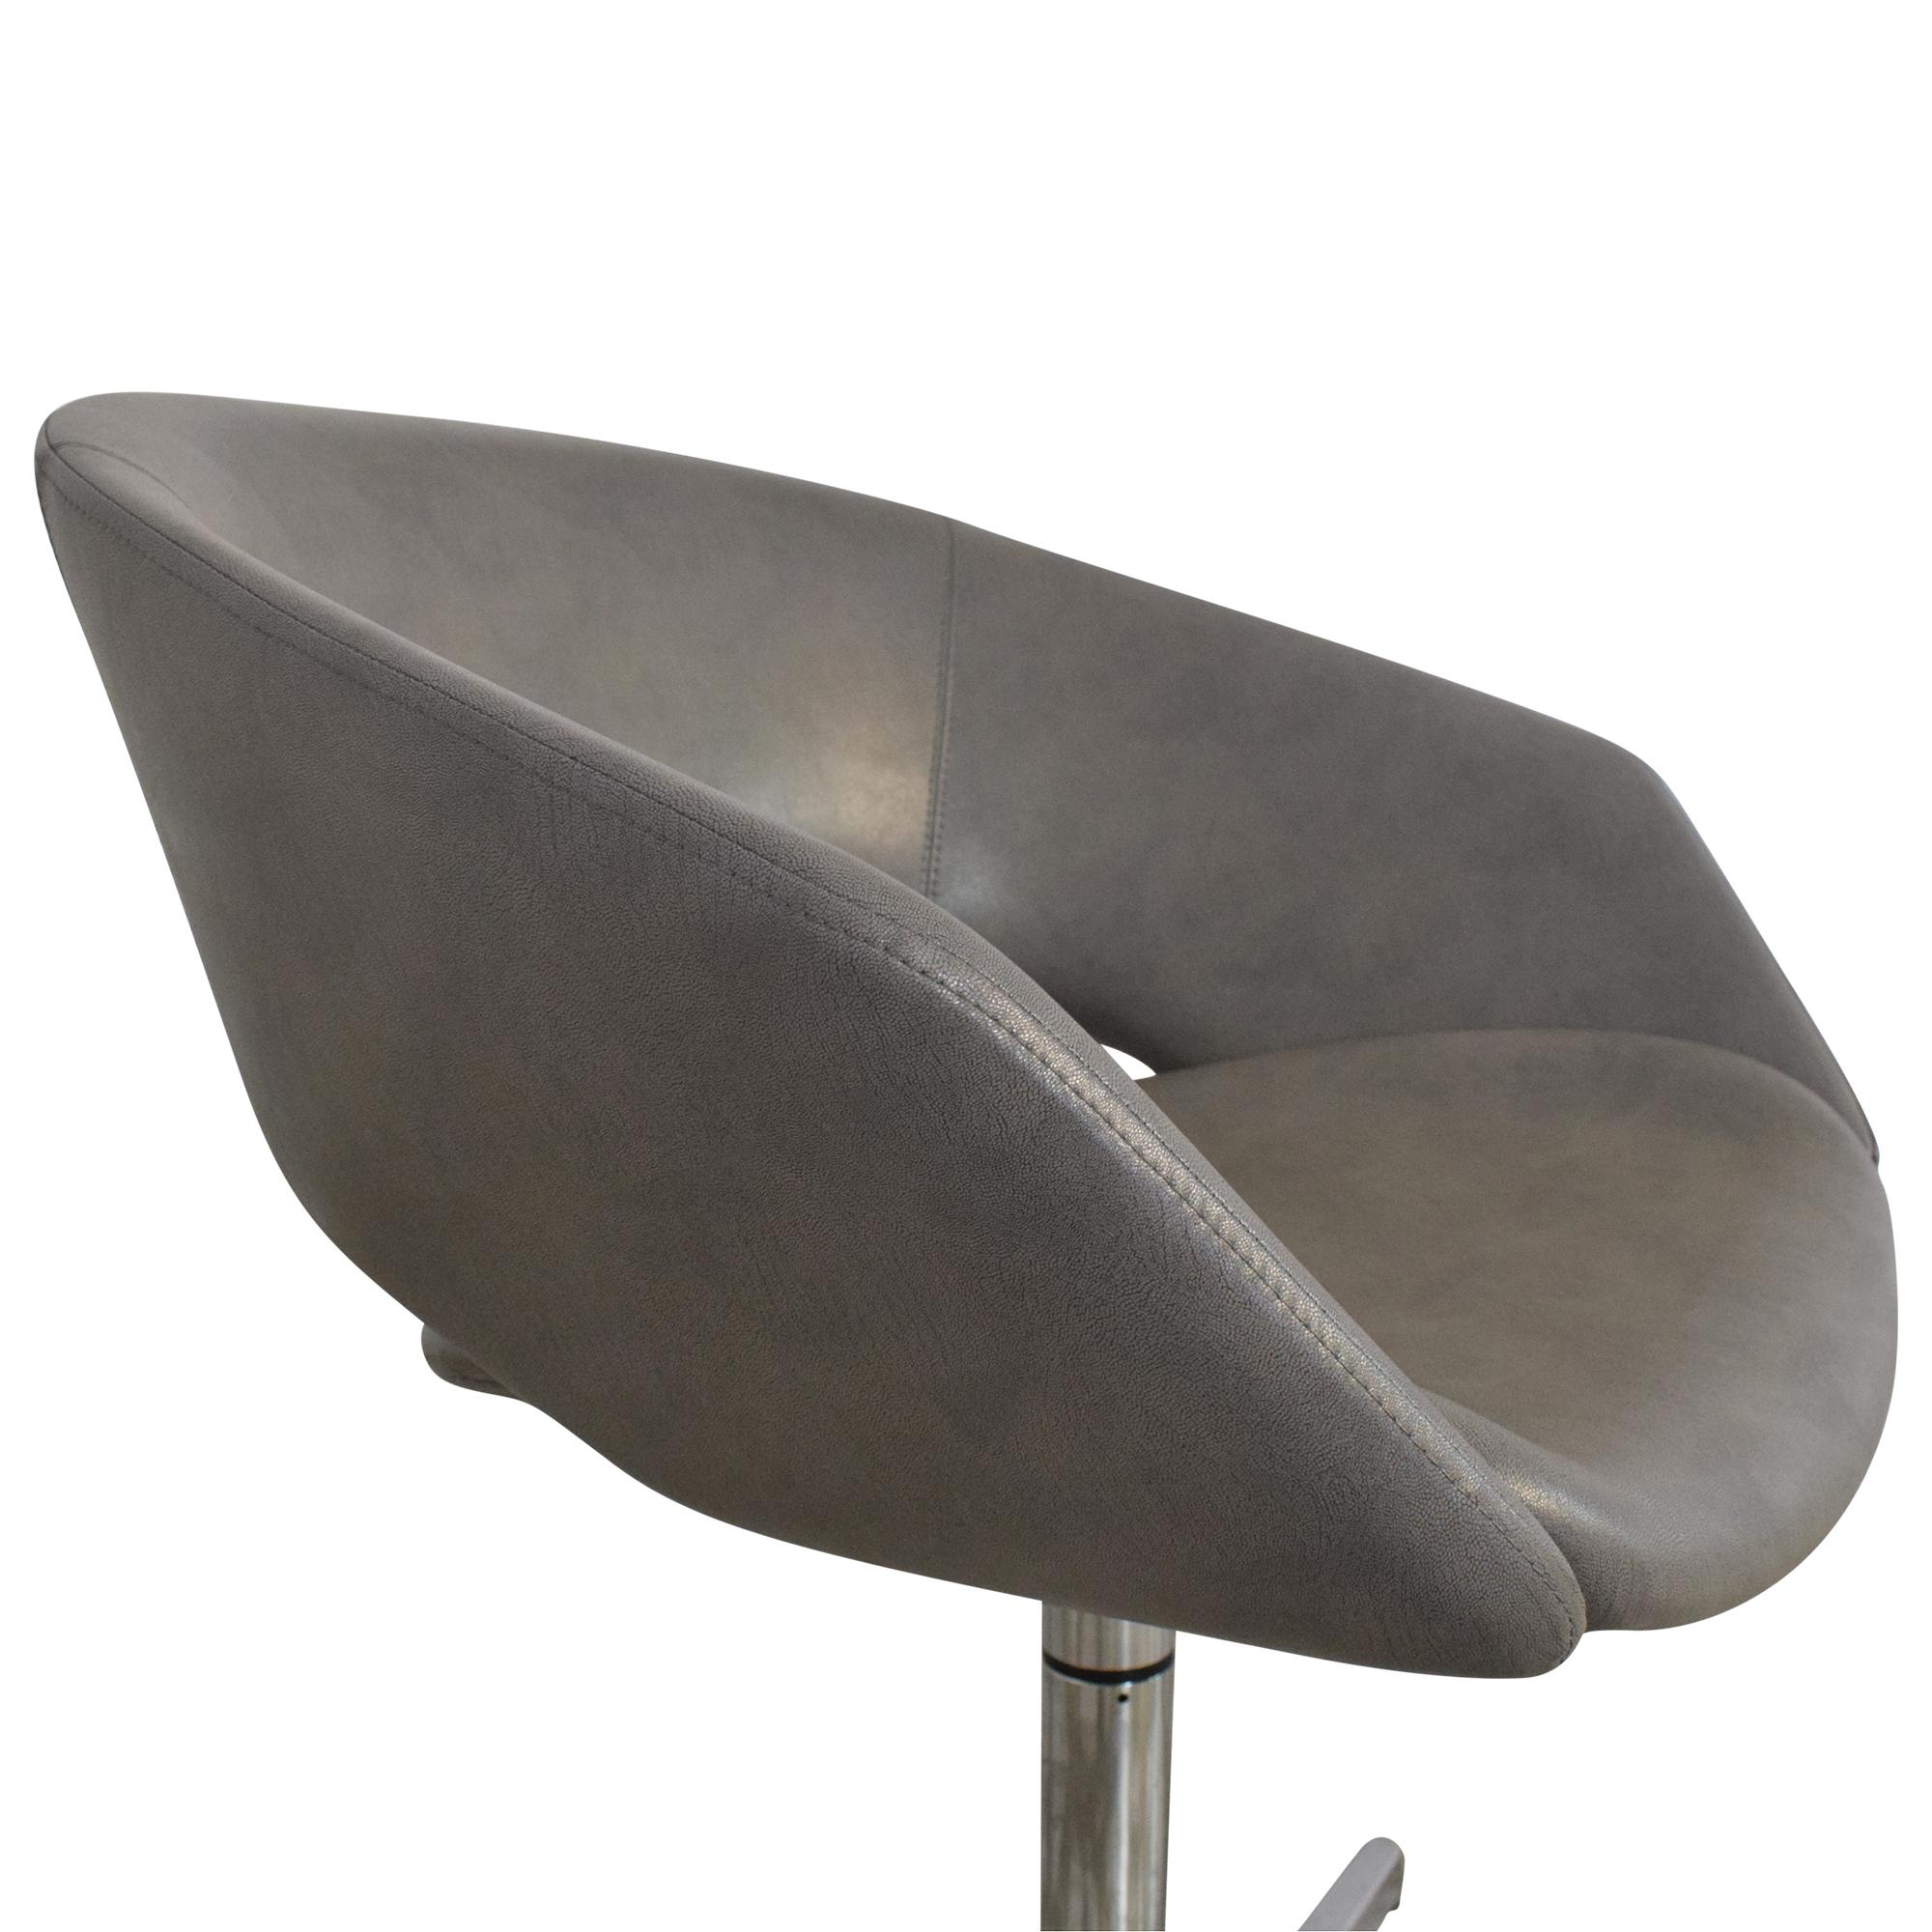 Leland International Leland Mod Pedestal Swivel Chair ct